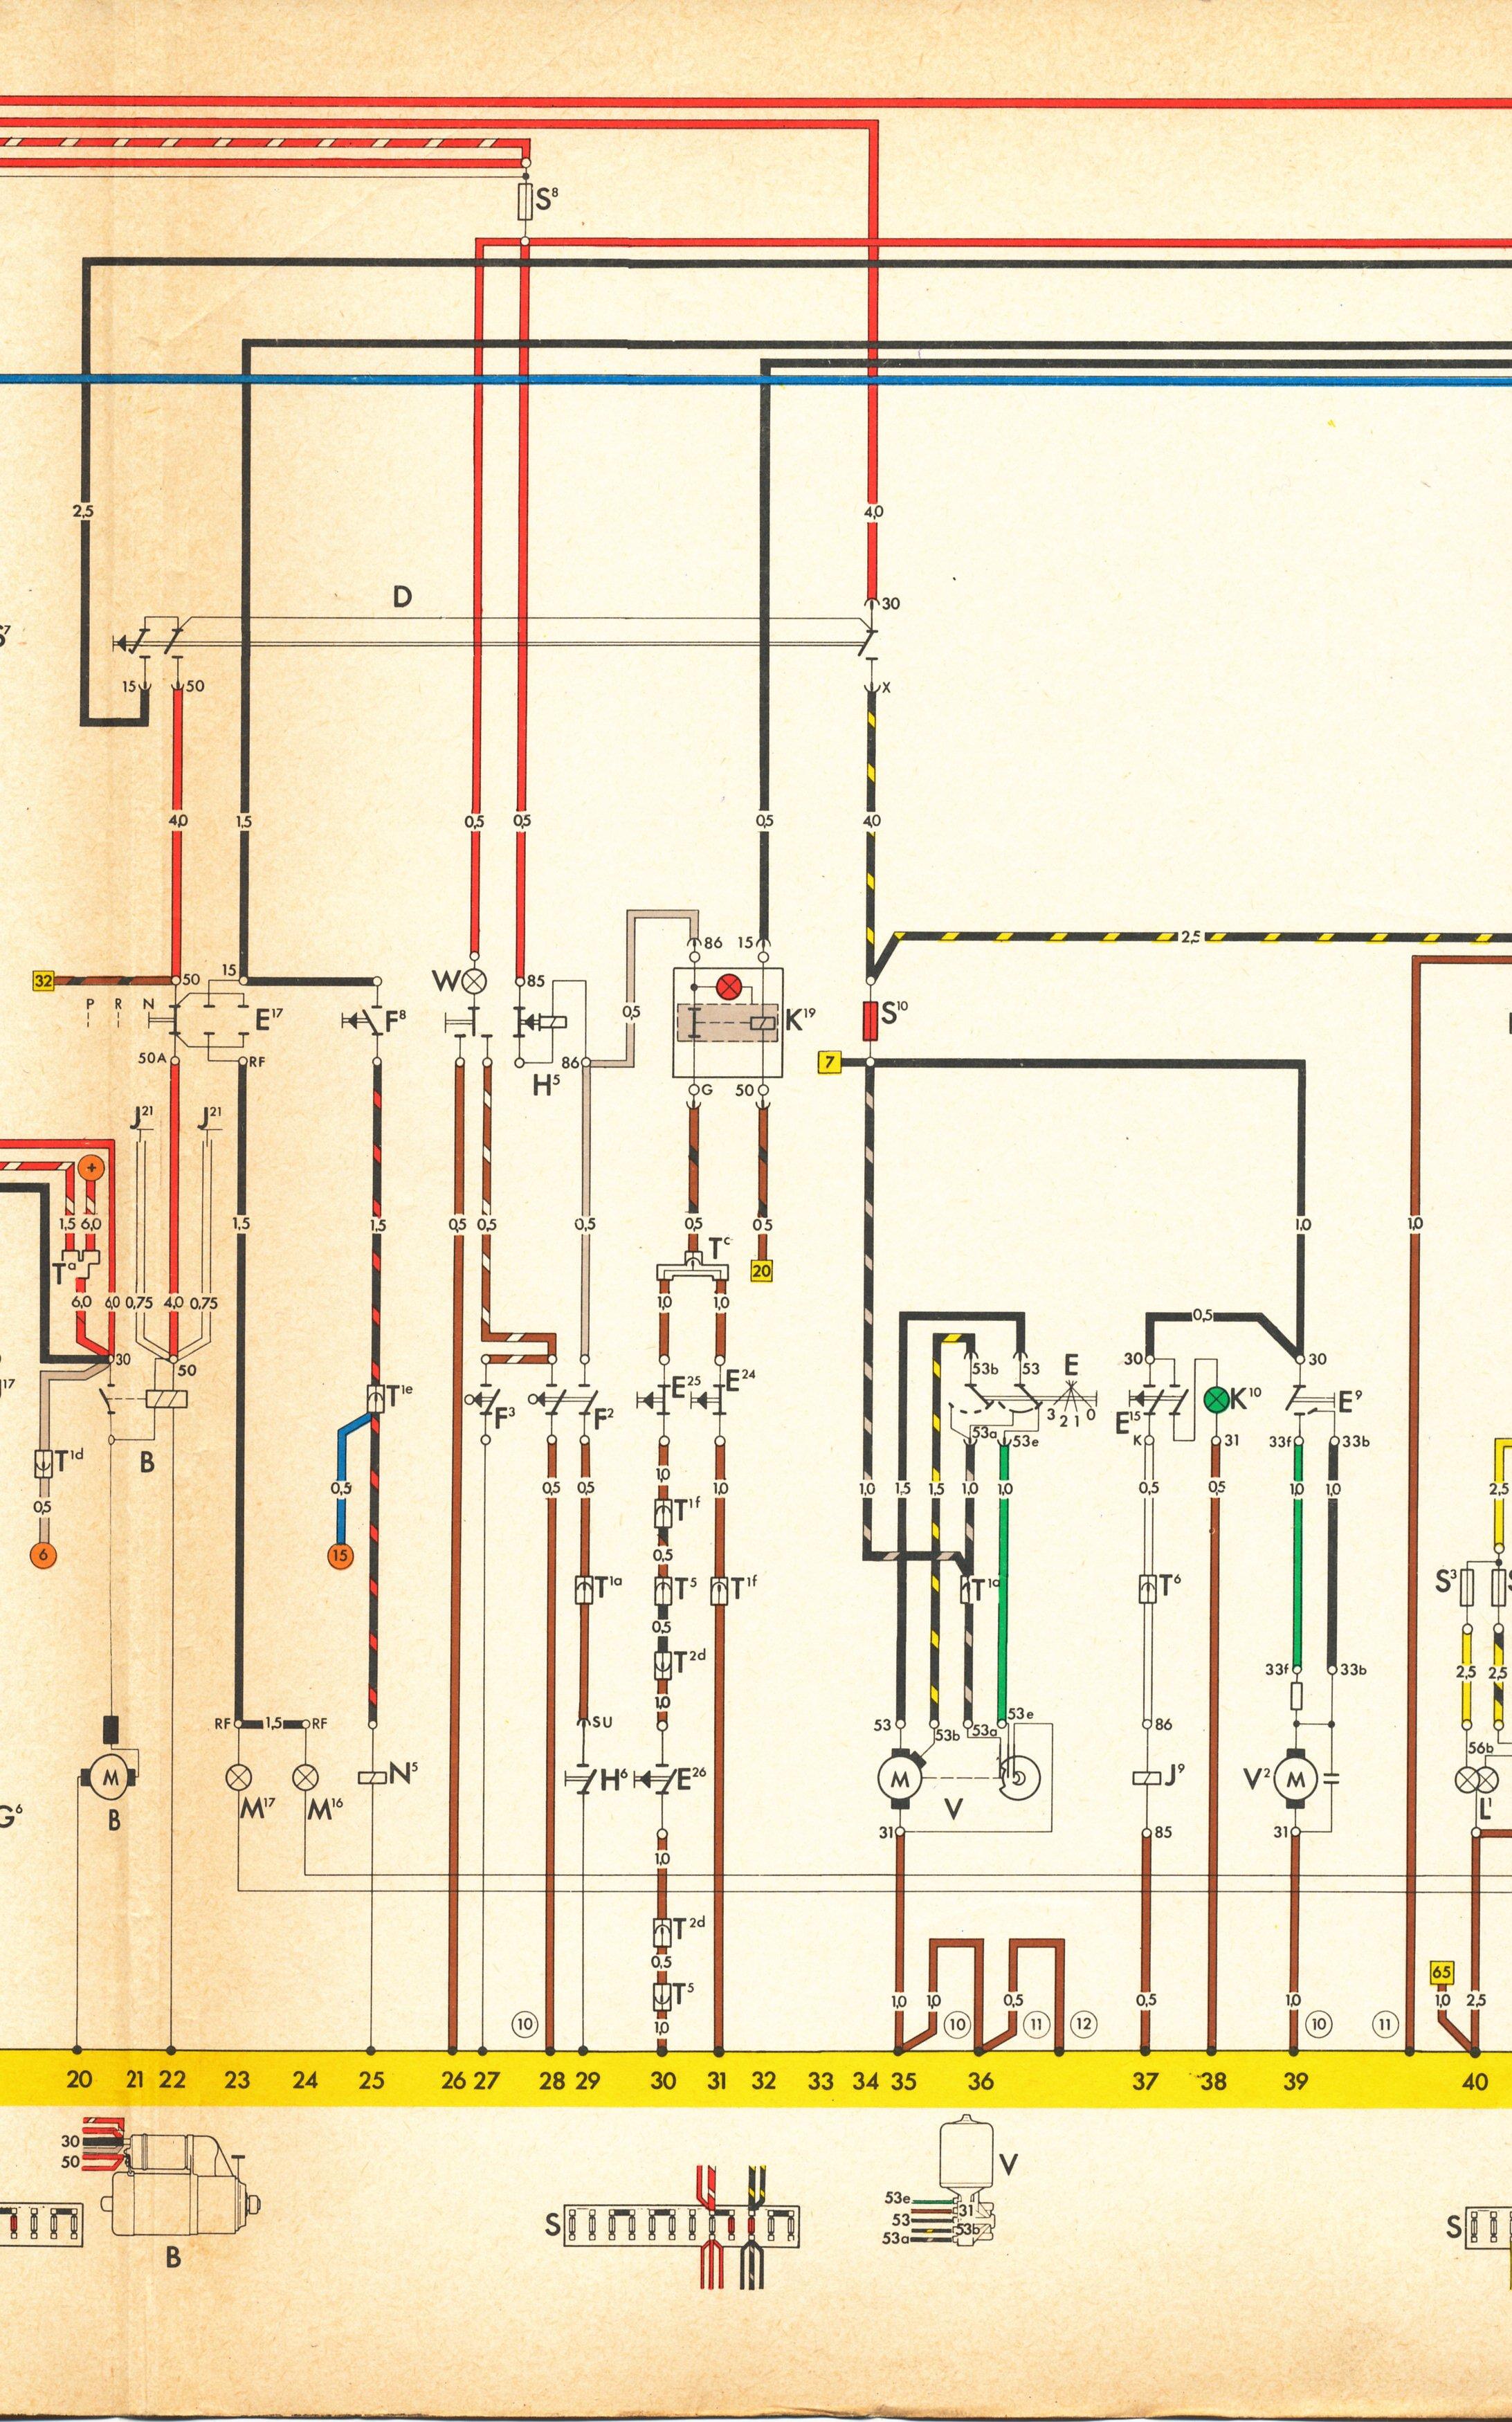 Diagram Thesamba Com Type 4 Wiring Diagrams